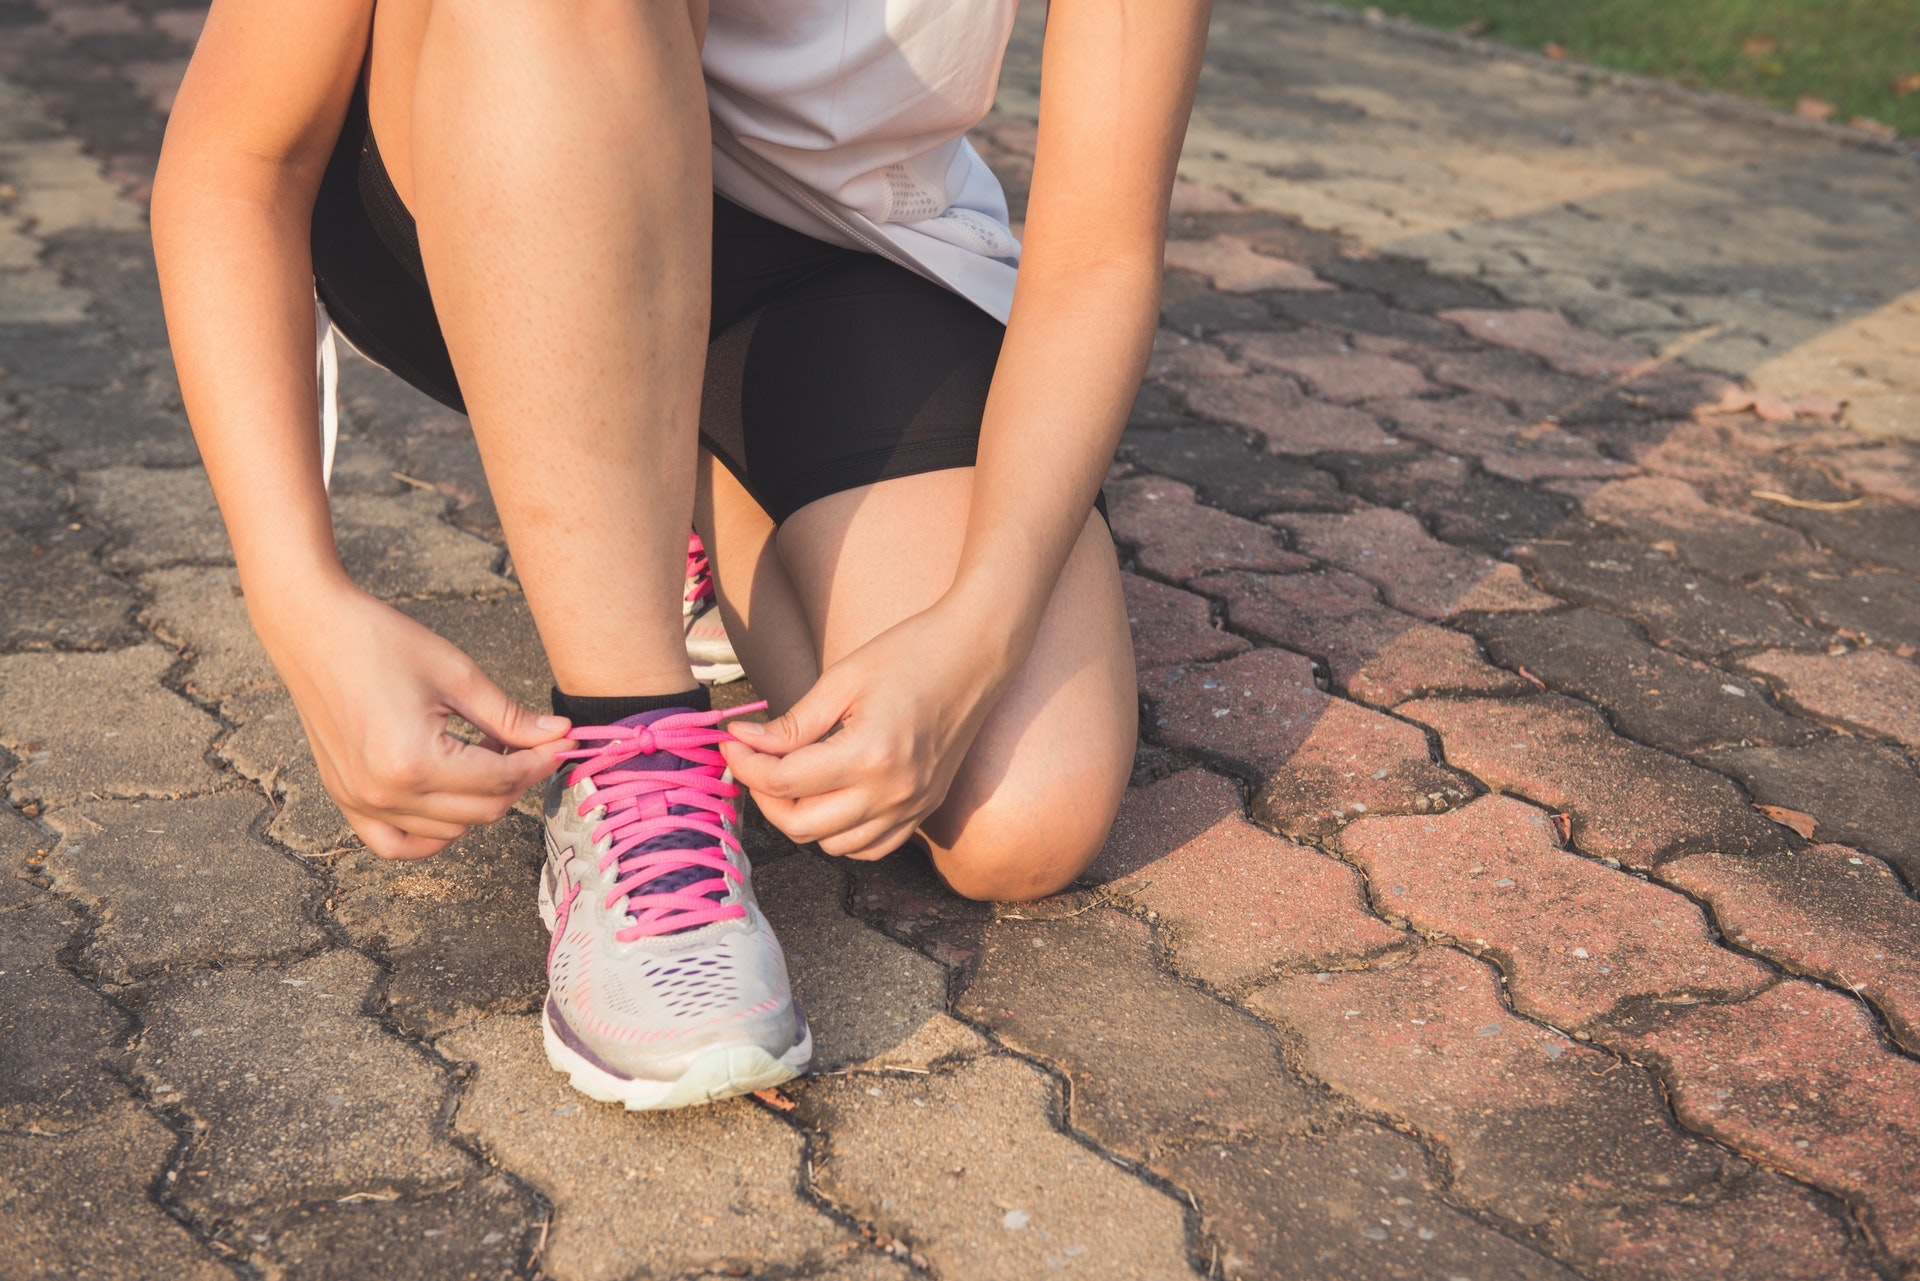 Types of training: Running